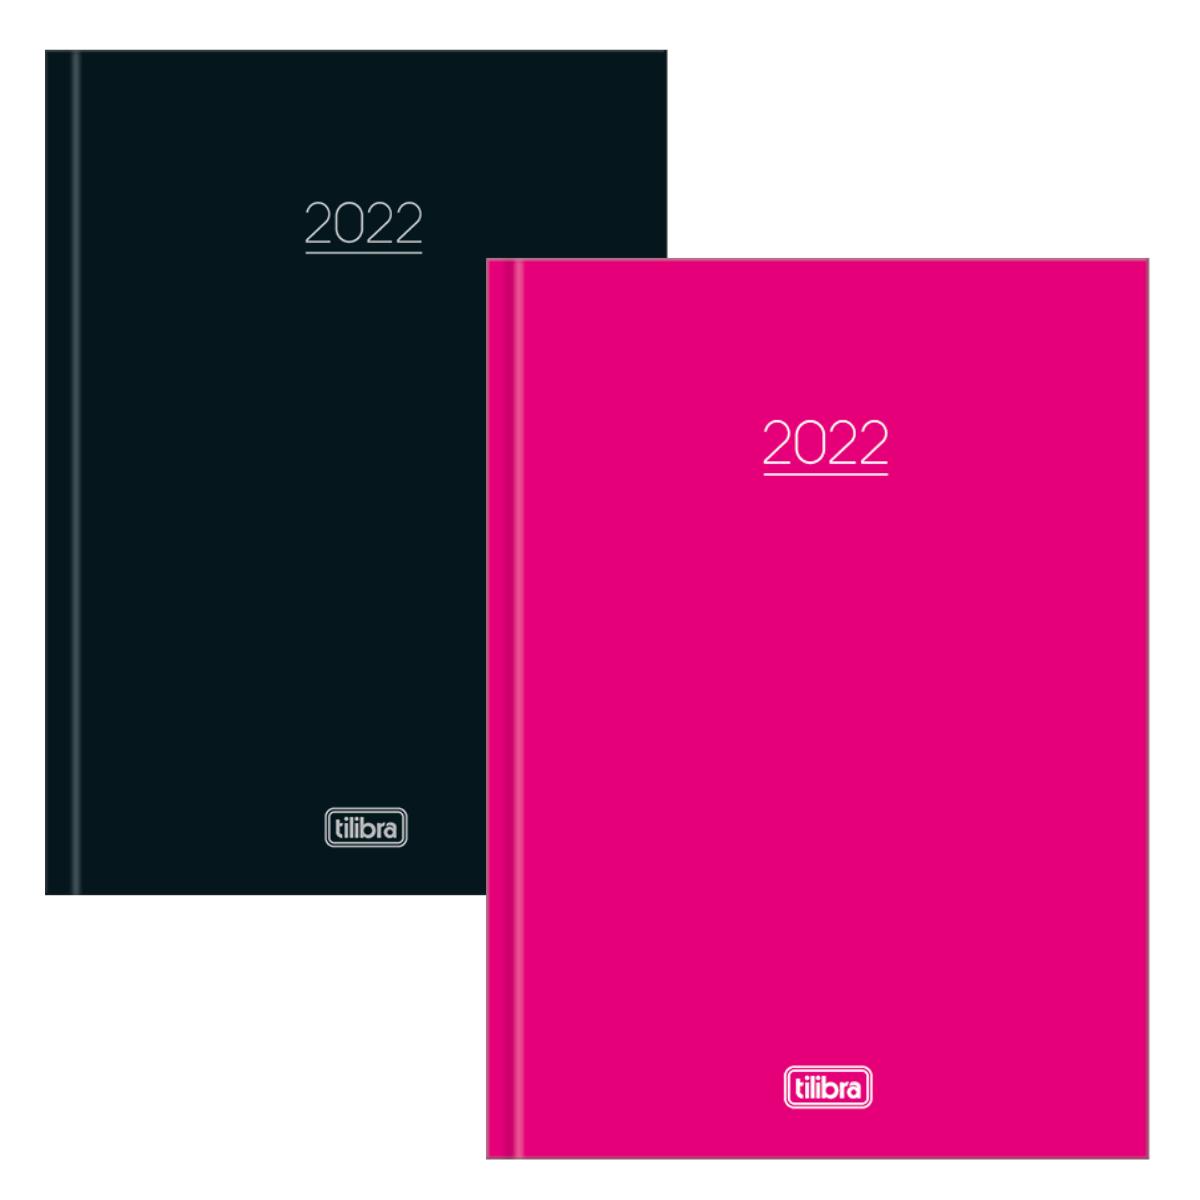 Agenda 2022 Pepper Capa dura  Executiva Preta/Rosa - Tilibra